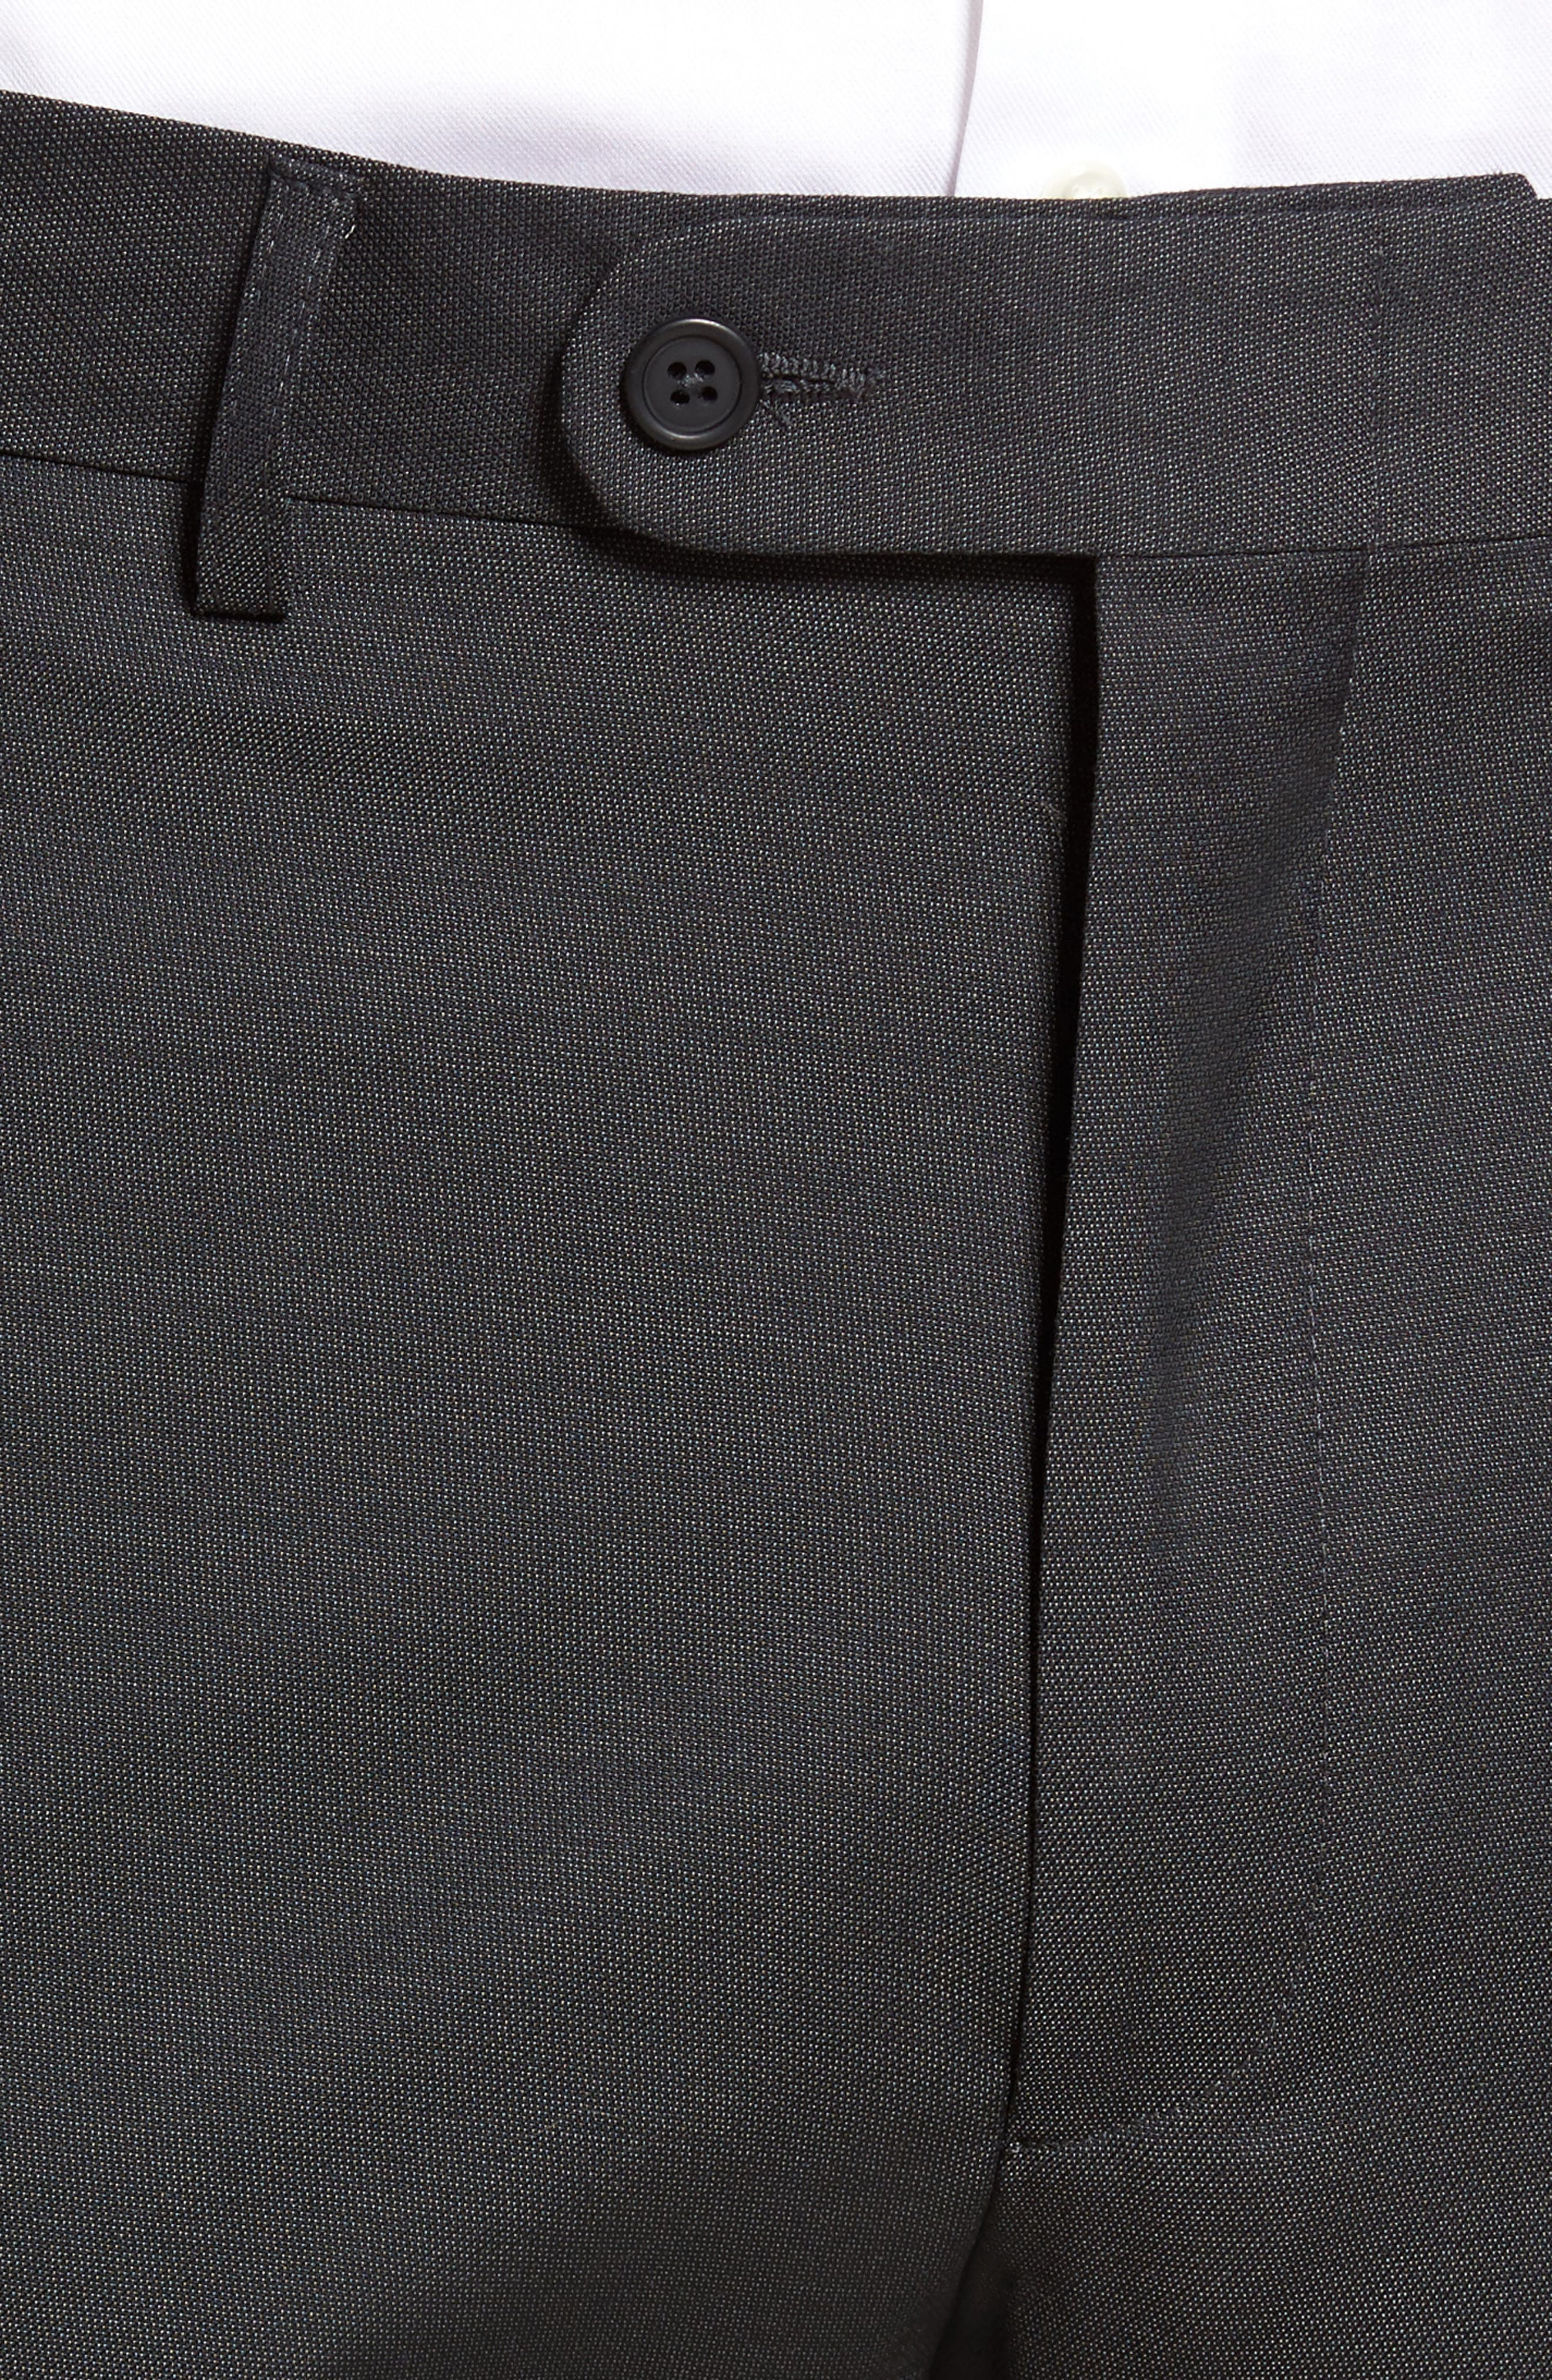 Pin Dot Wool Trousers,                             Alternate thumbnail 9, color,